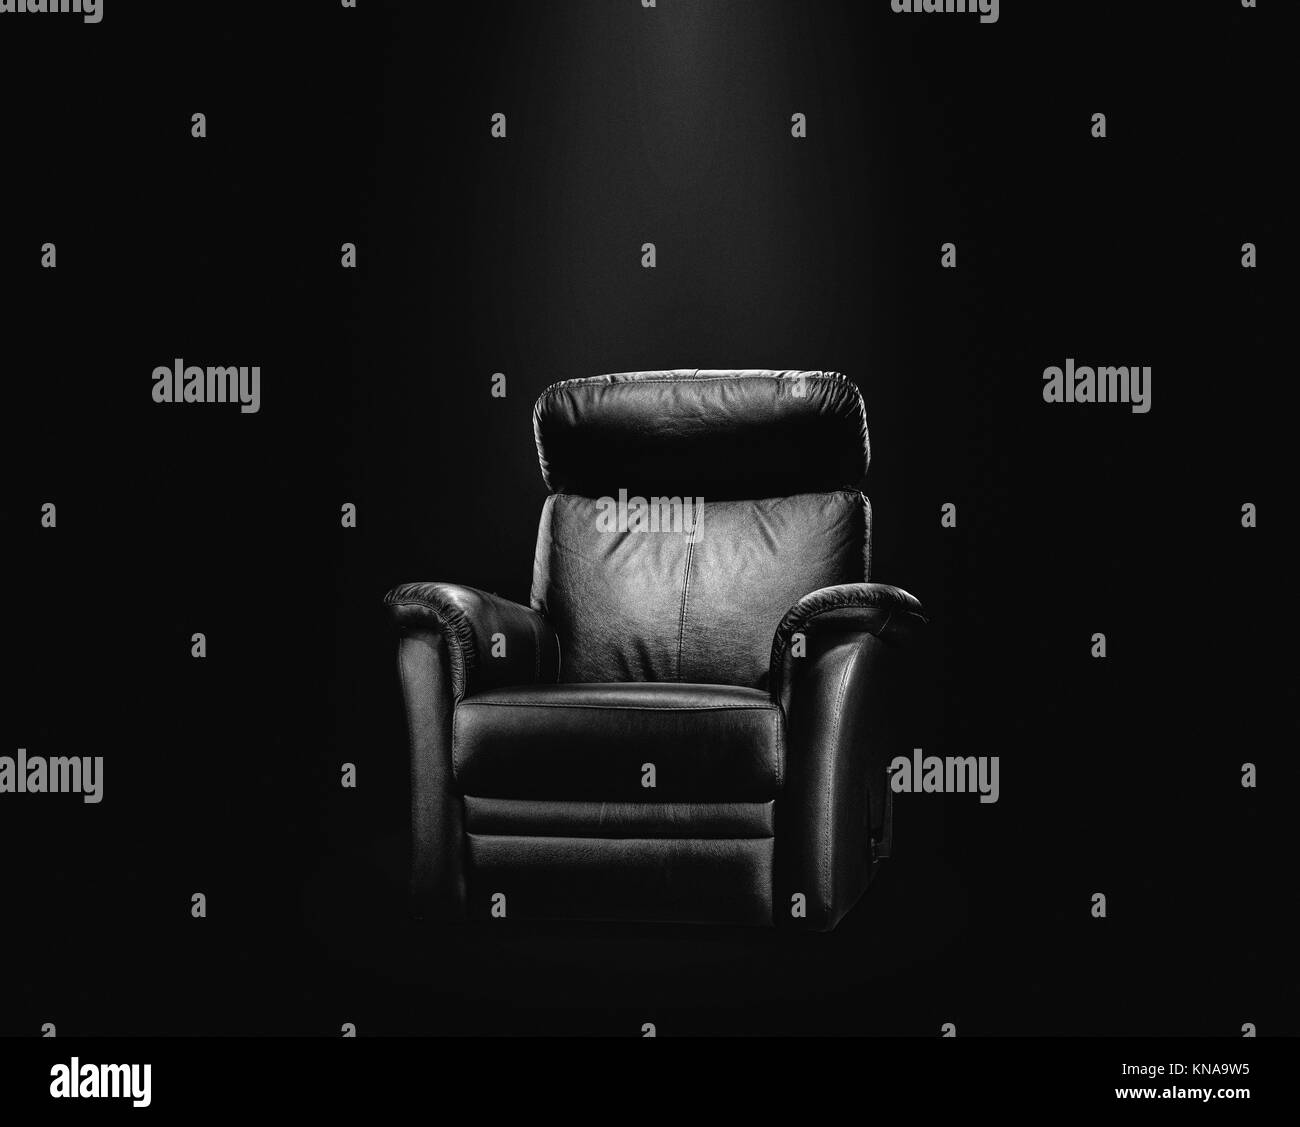 Black leather armchair in spotlight, dark background. - Stock Image